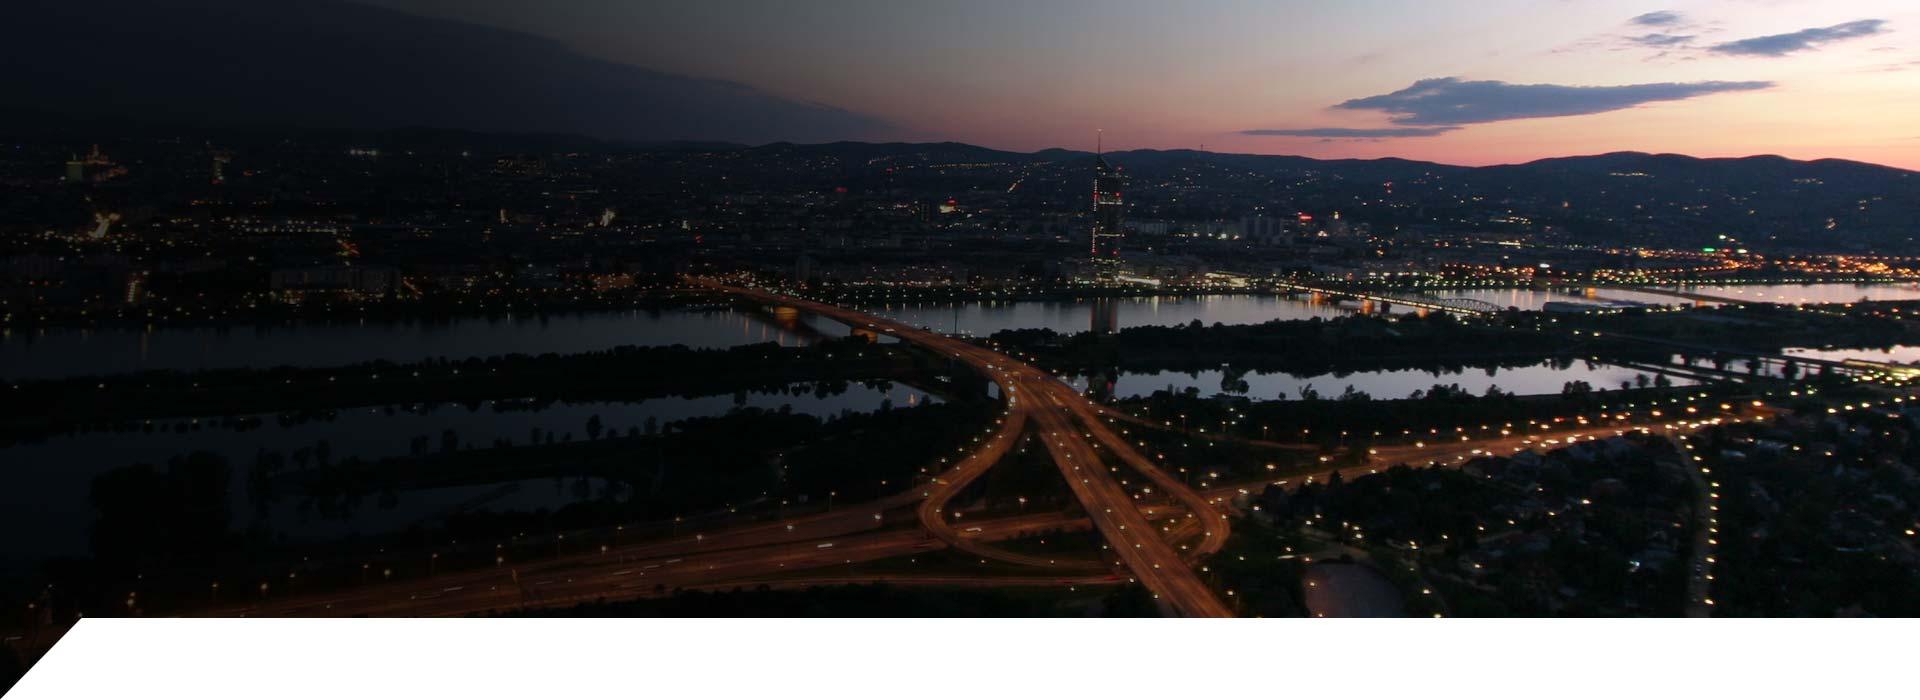 Österreichs Hauptstadt Wien